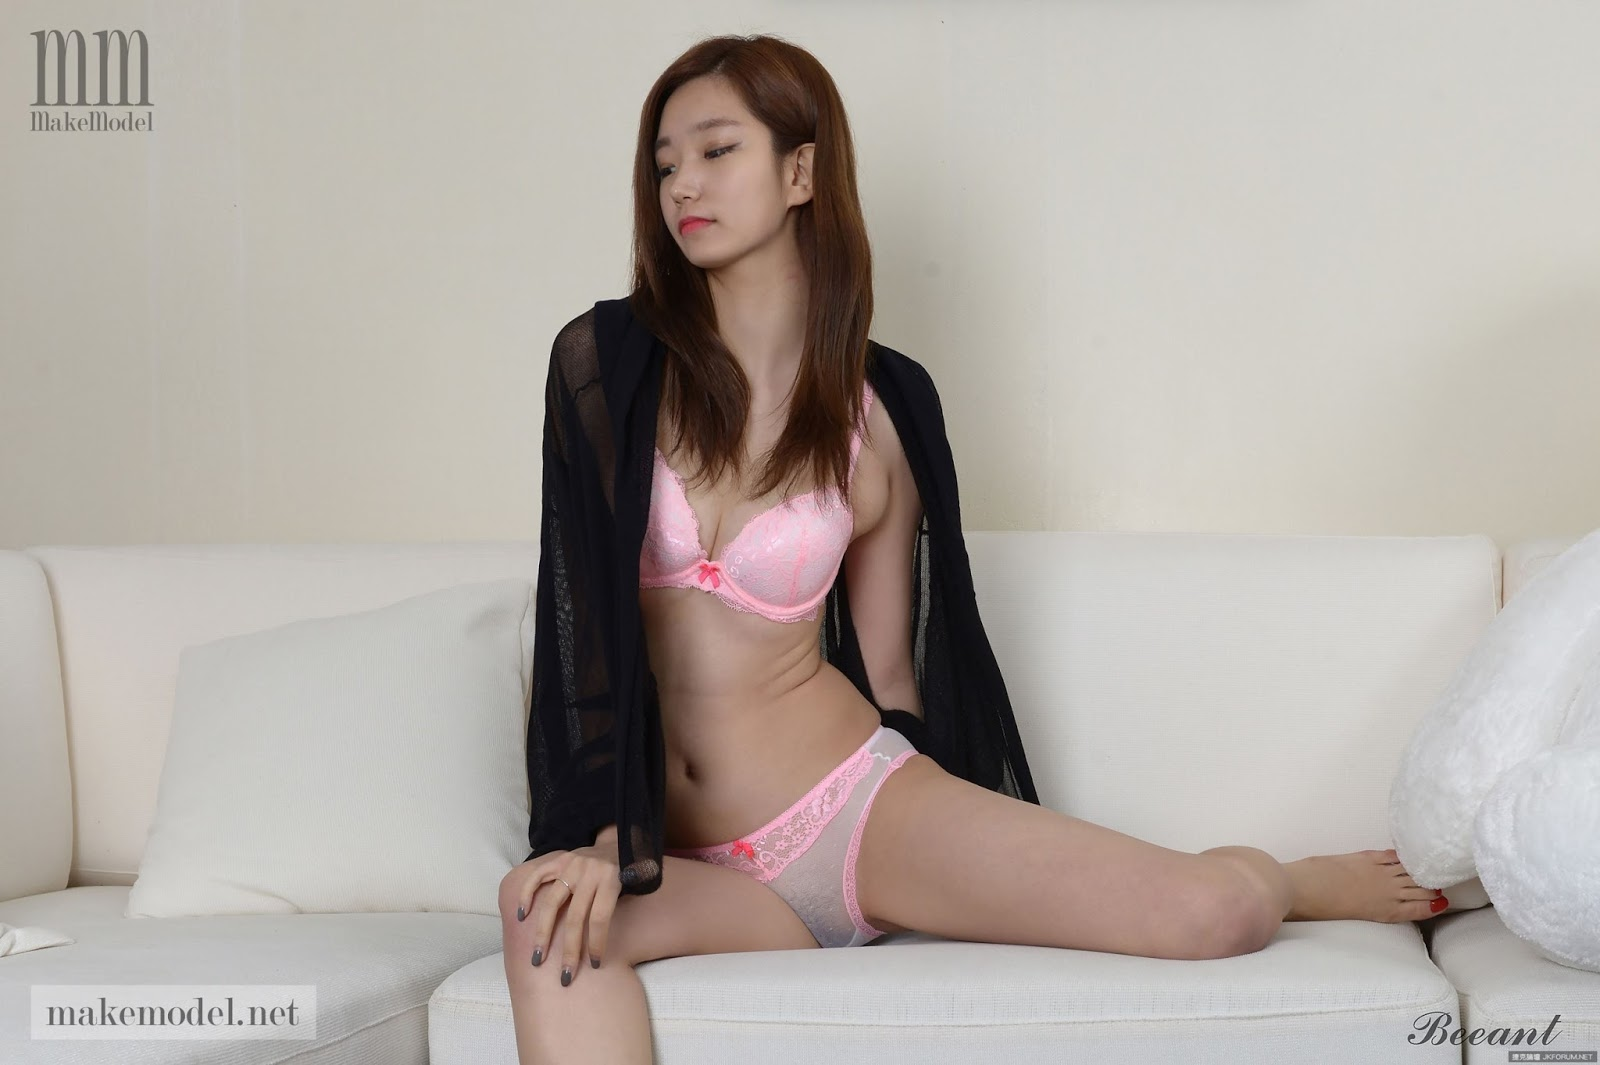 Dayeong%2BPretty%2B%25E9%259F%2593%25E5%259C%258B%2BKorean%2BTeen%2BNaked%2B%2526%2BUncensored 270912 21 - Korean Nude - Big Albom Remain #A-korean girl